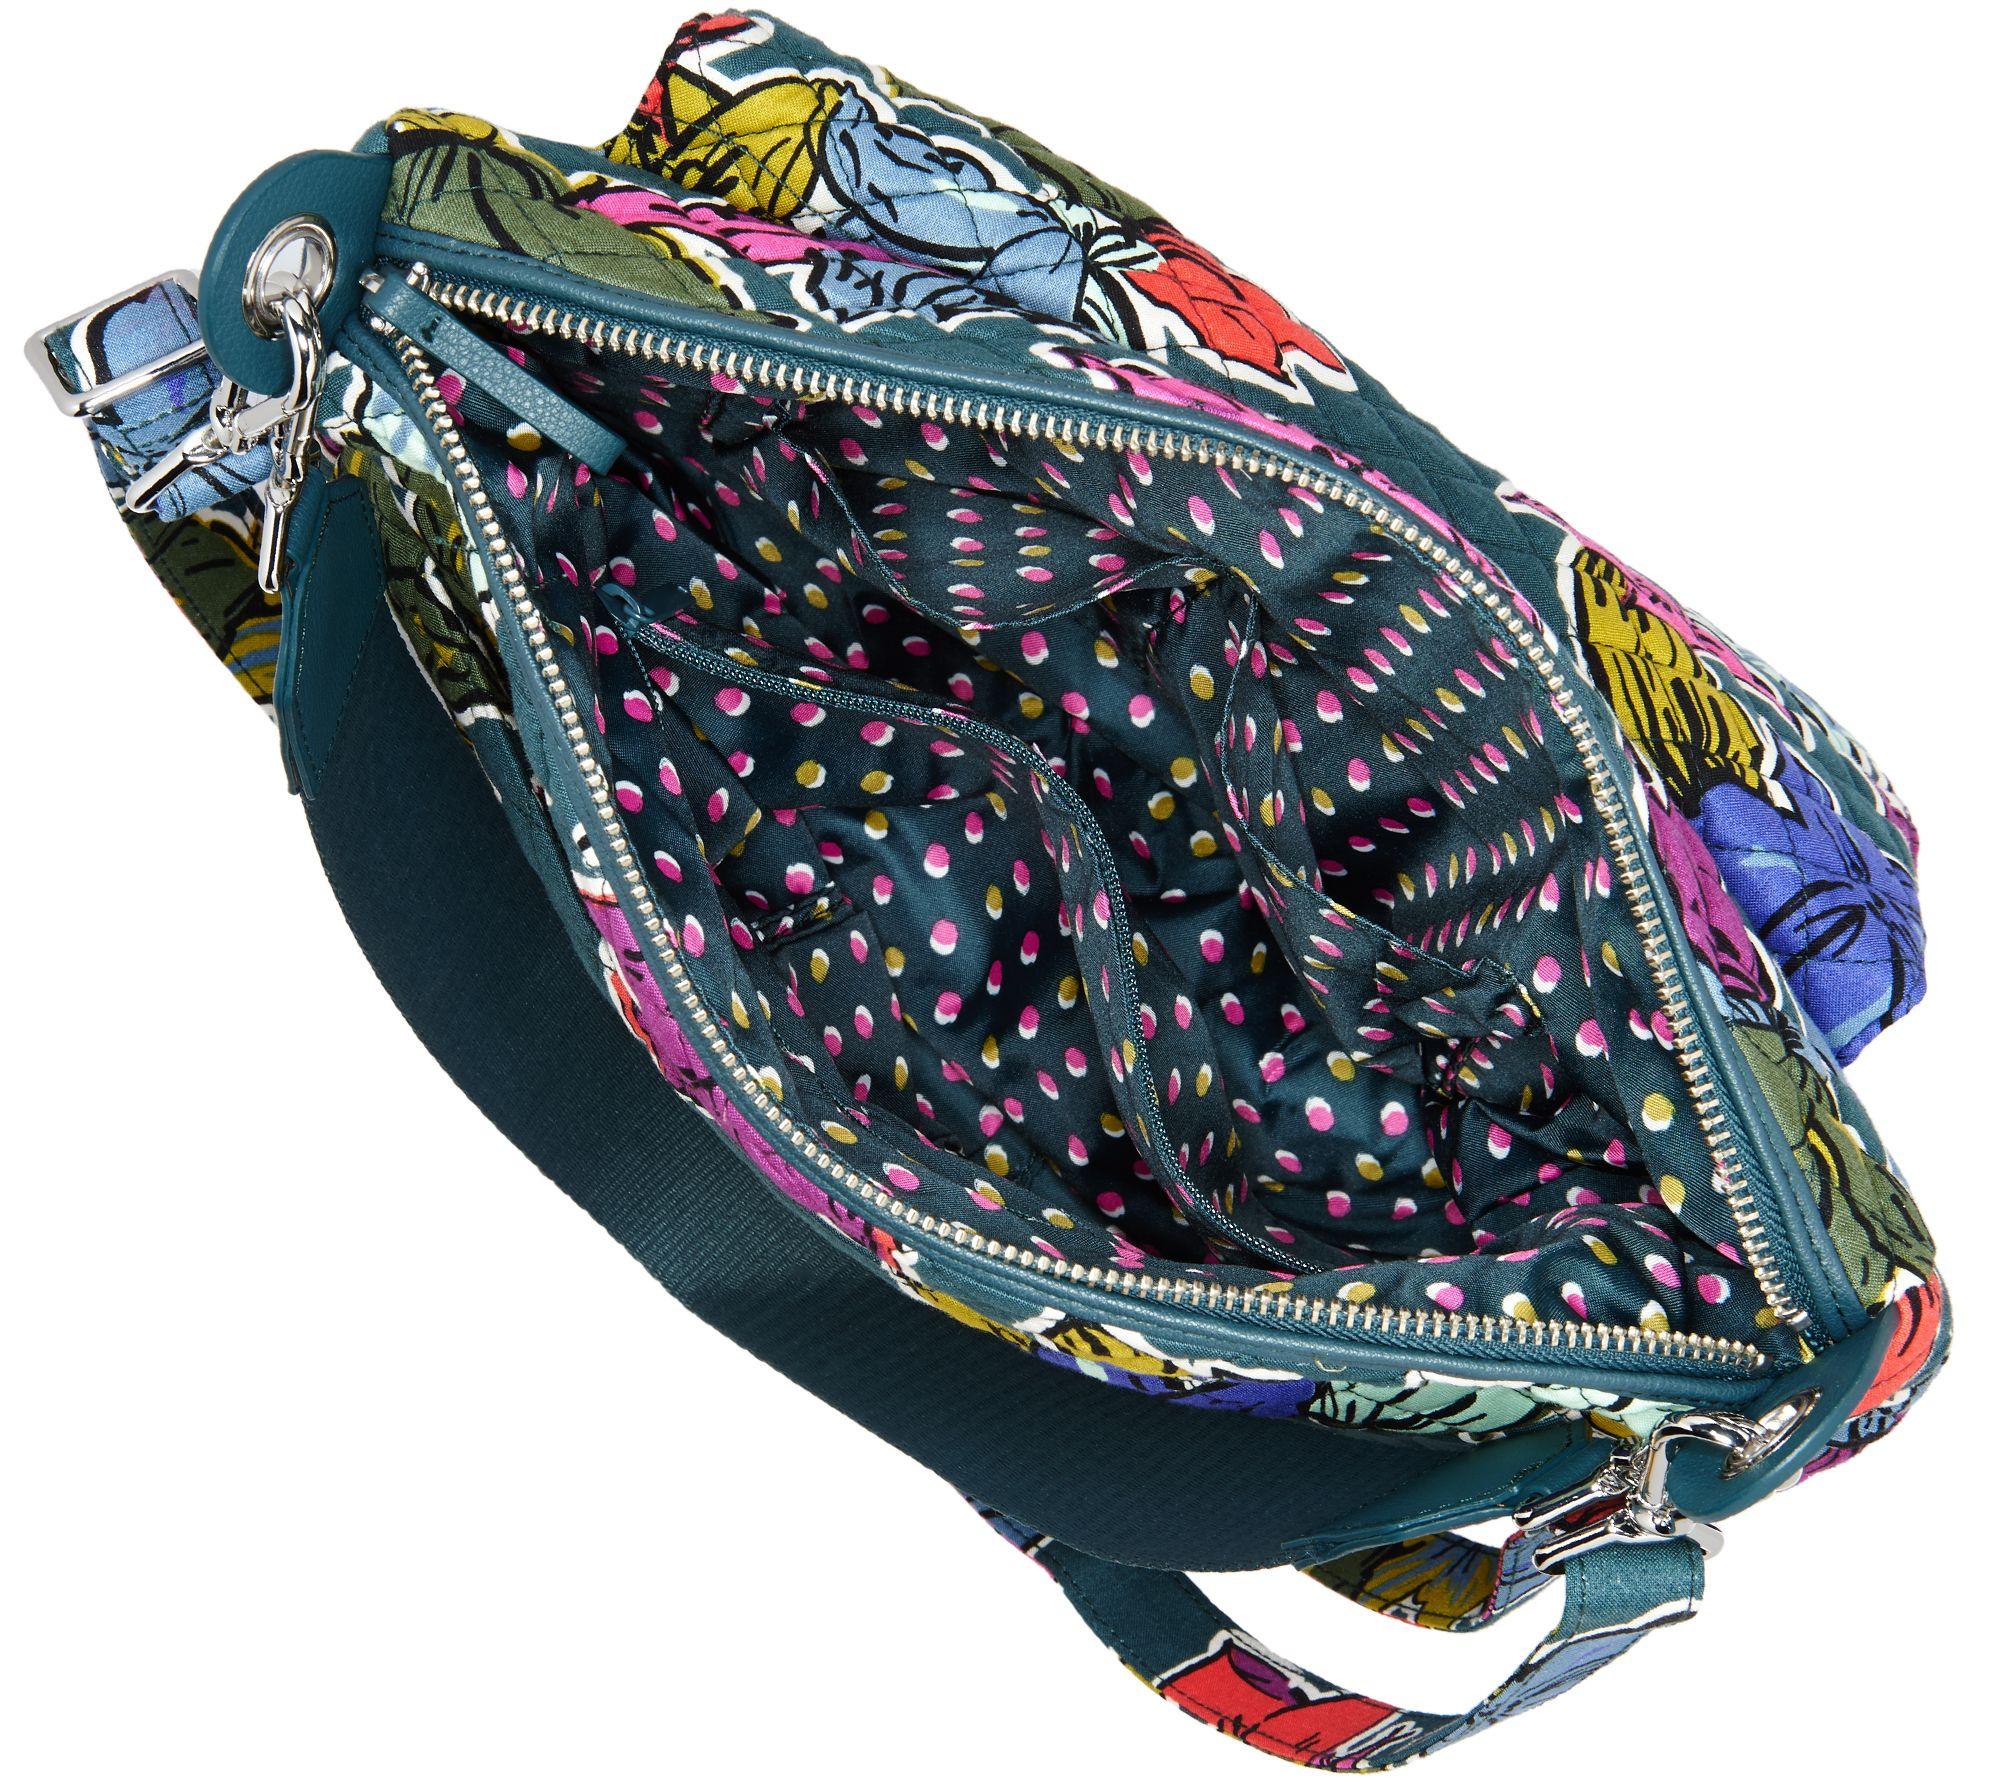 be1ef21486cb Vera Bradley Signature Print Carson Shoulder Bag - Page 1 — QVC.com